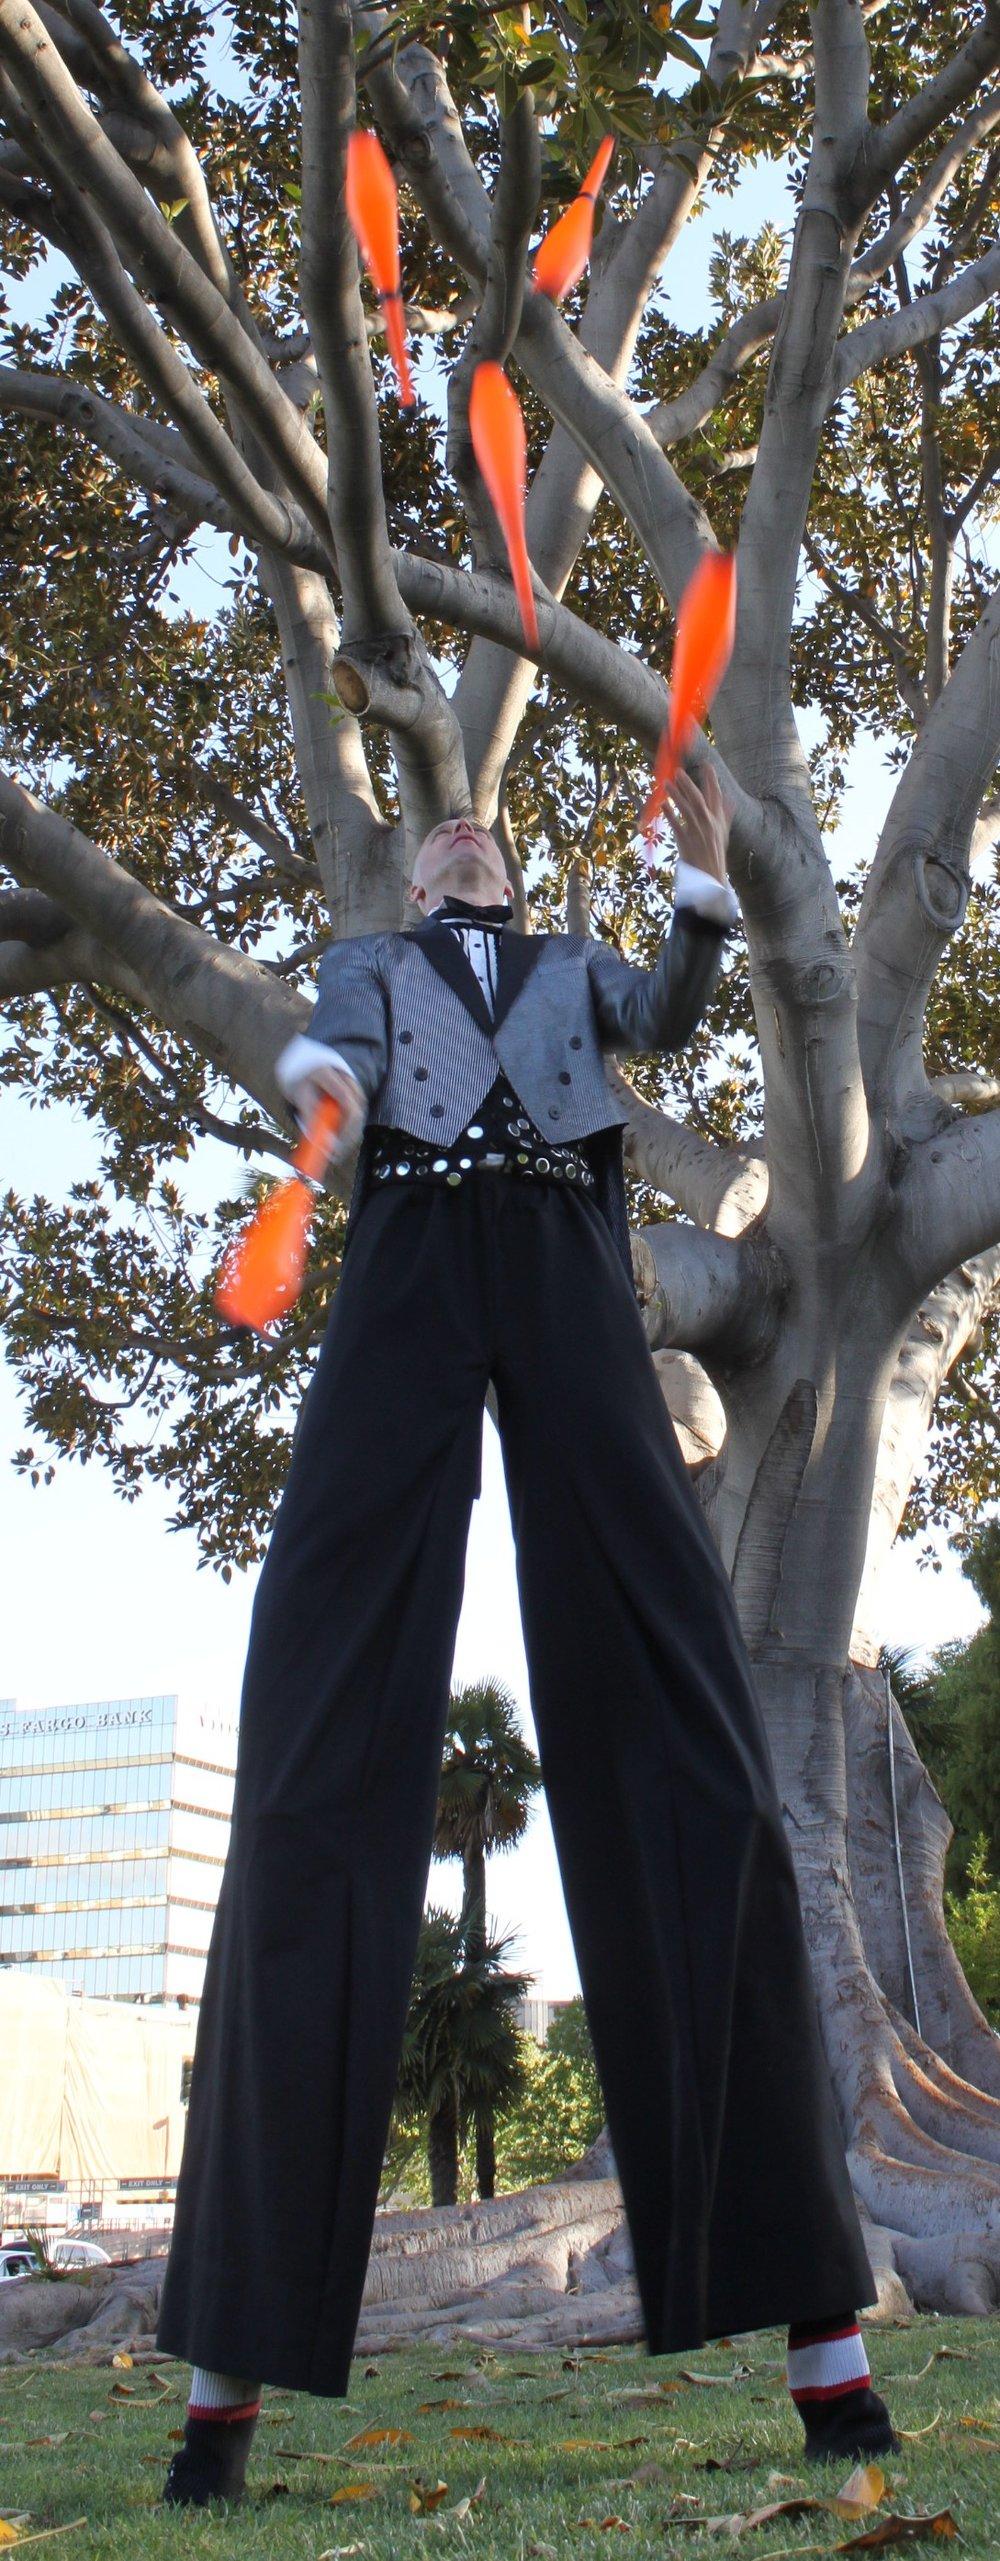 Rob Crites Juggling 5 clubs on Stilts.JPG